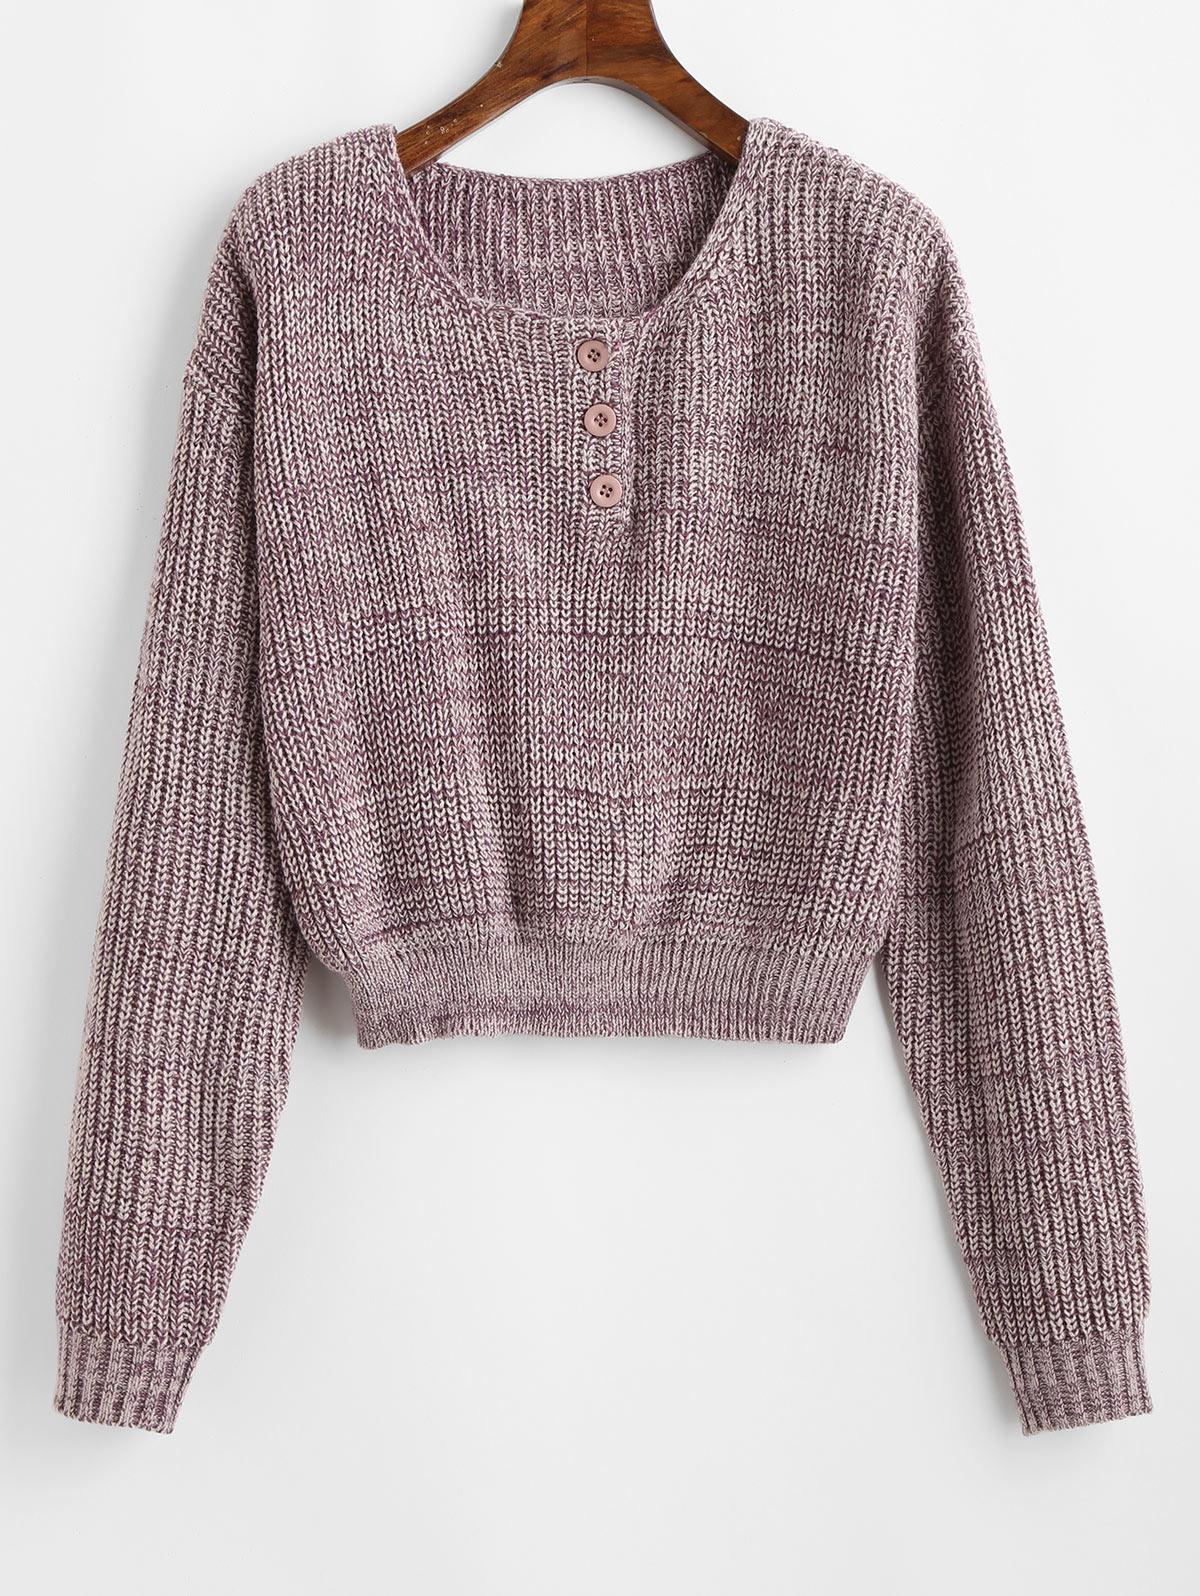 ZAFUL Pullover Half Buttoned Heathered Sweater, Wisteria purple